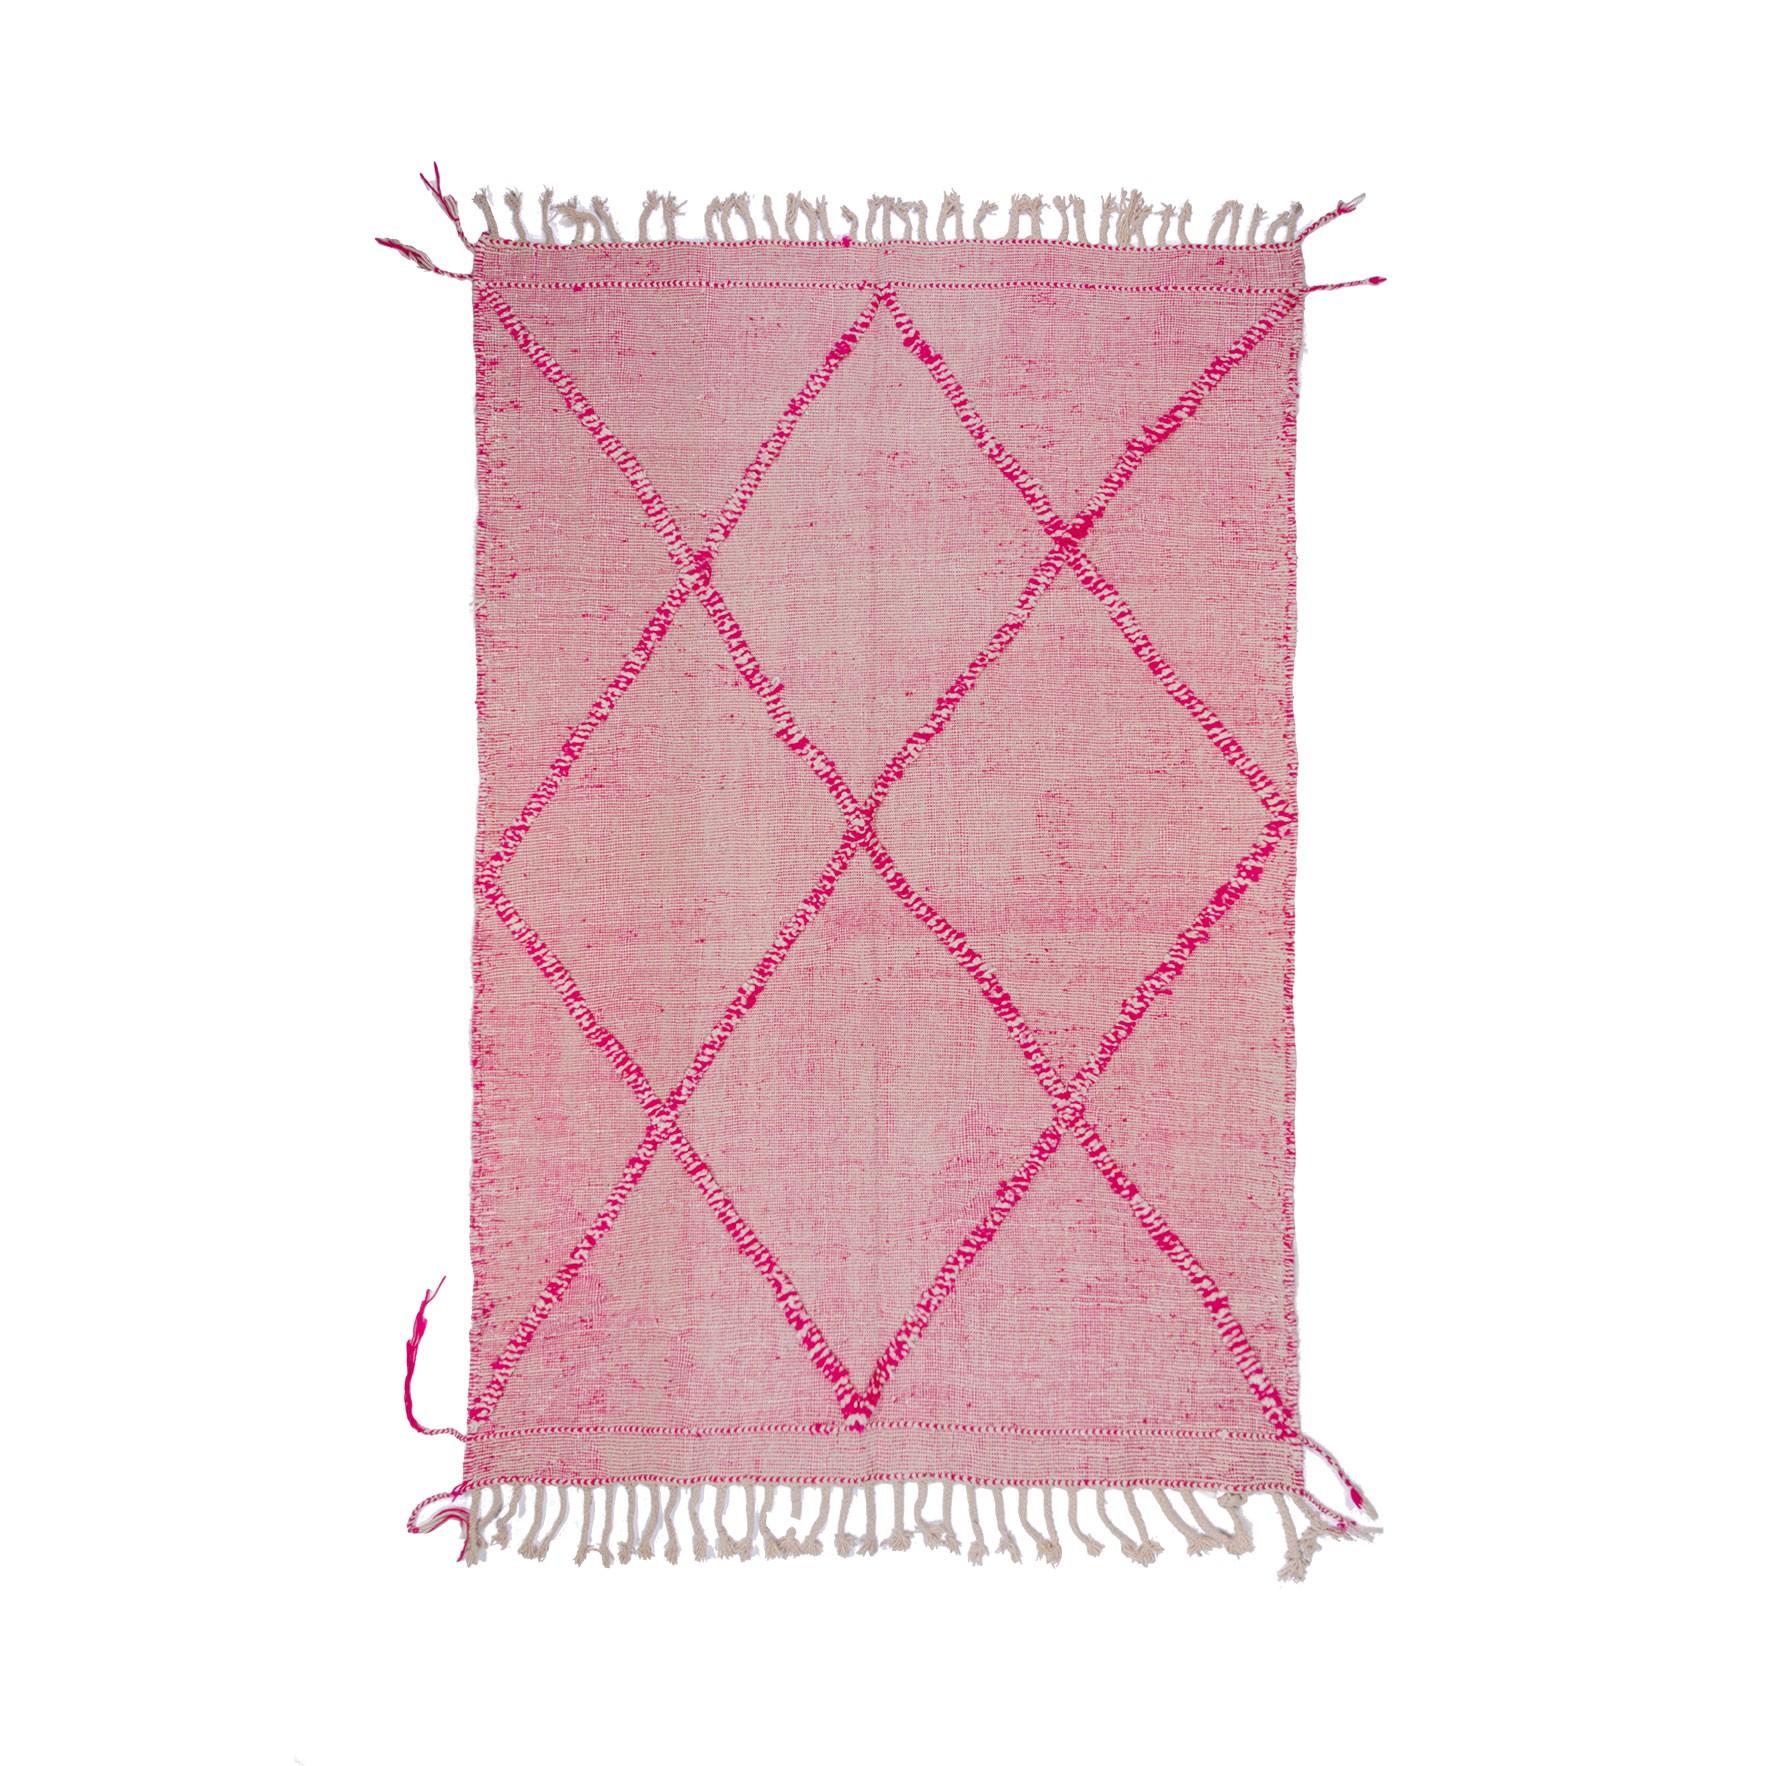 Two-tone pink kilim rug